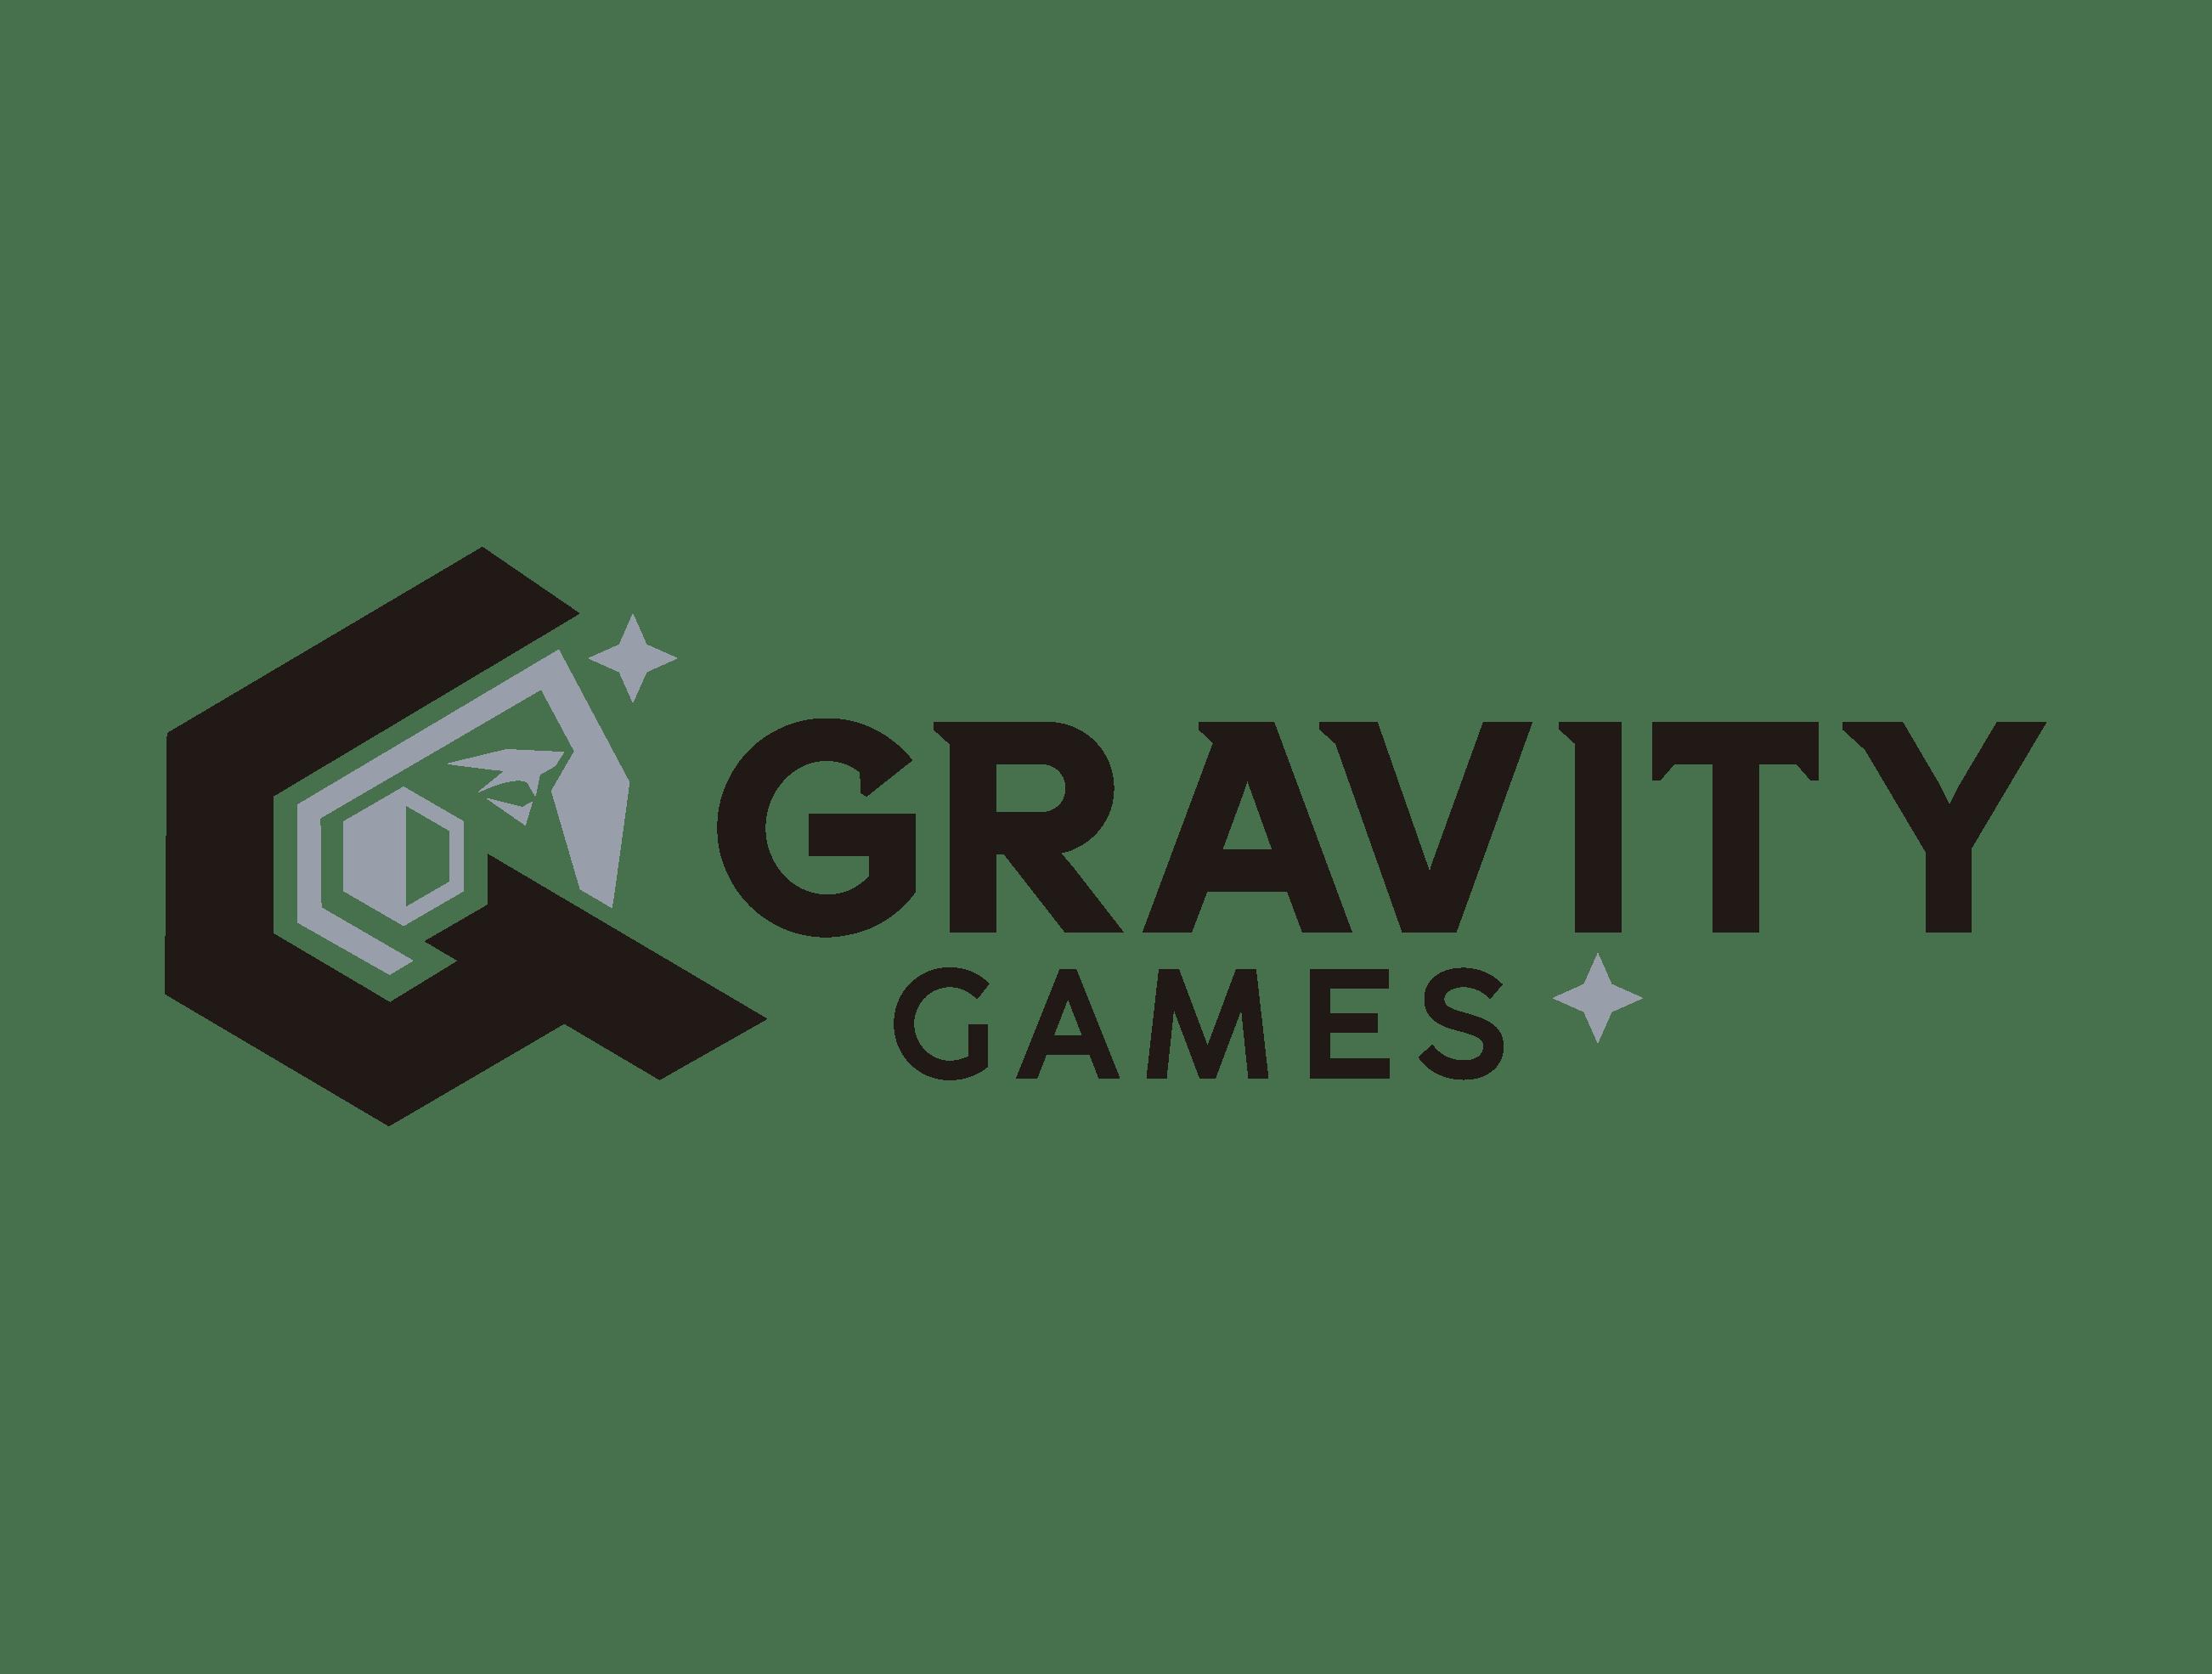 gravitygame_logo_meeplefoundry